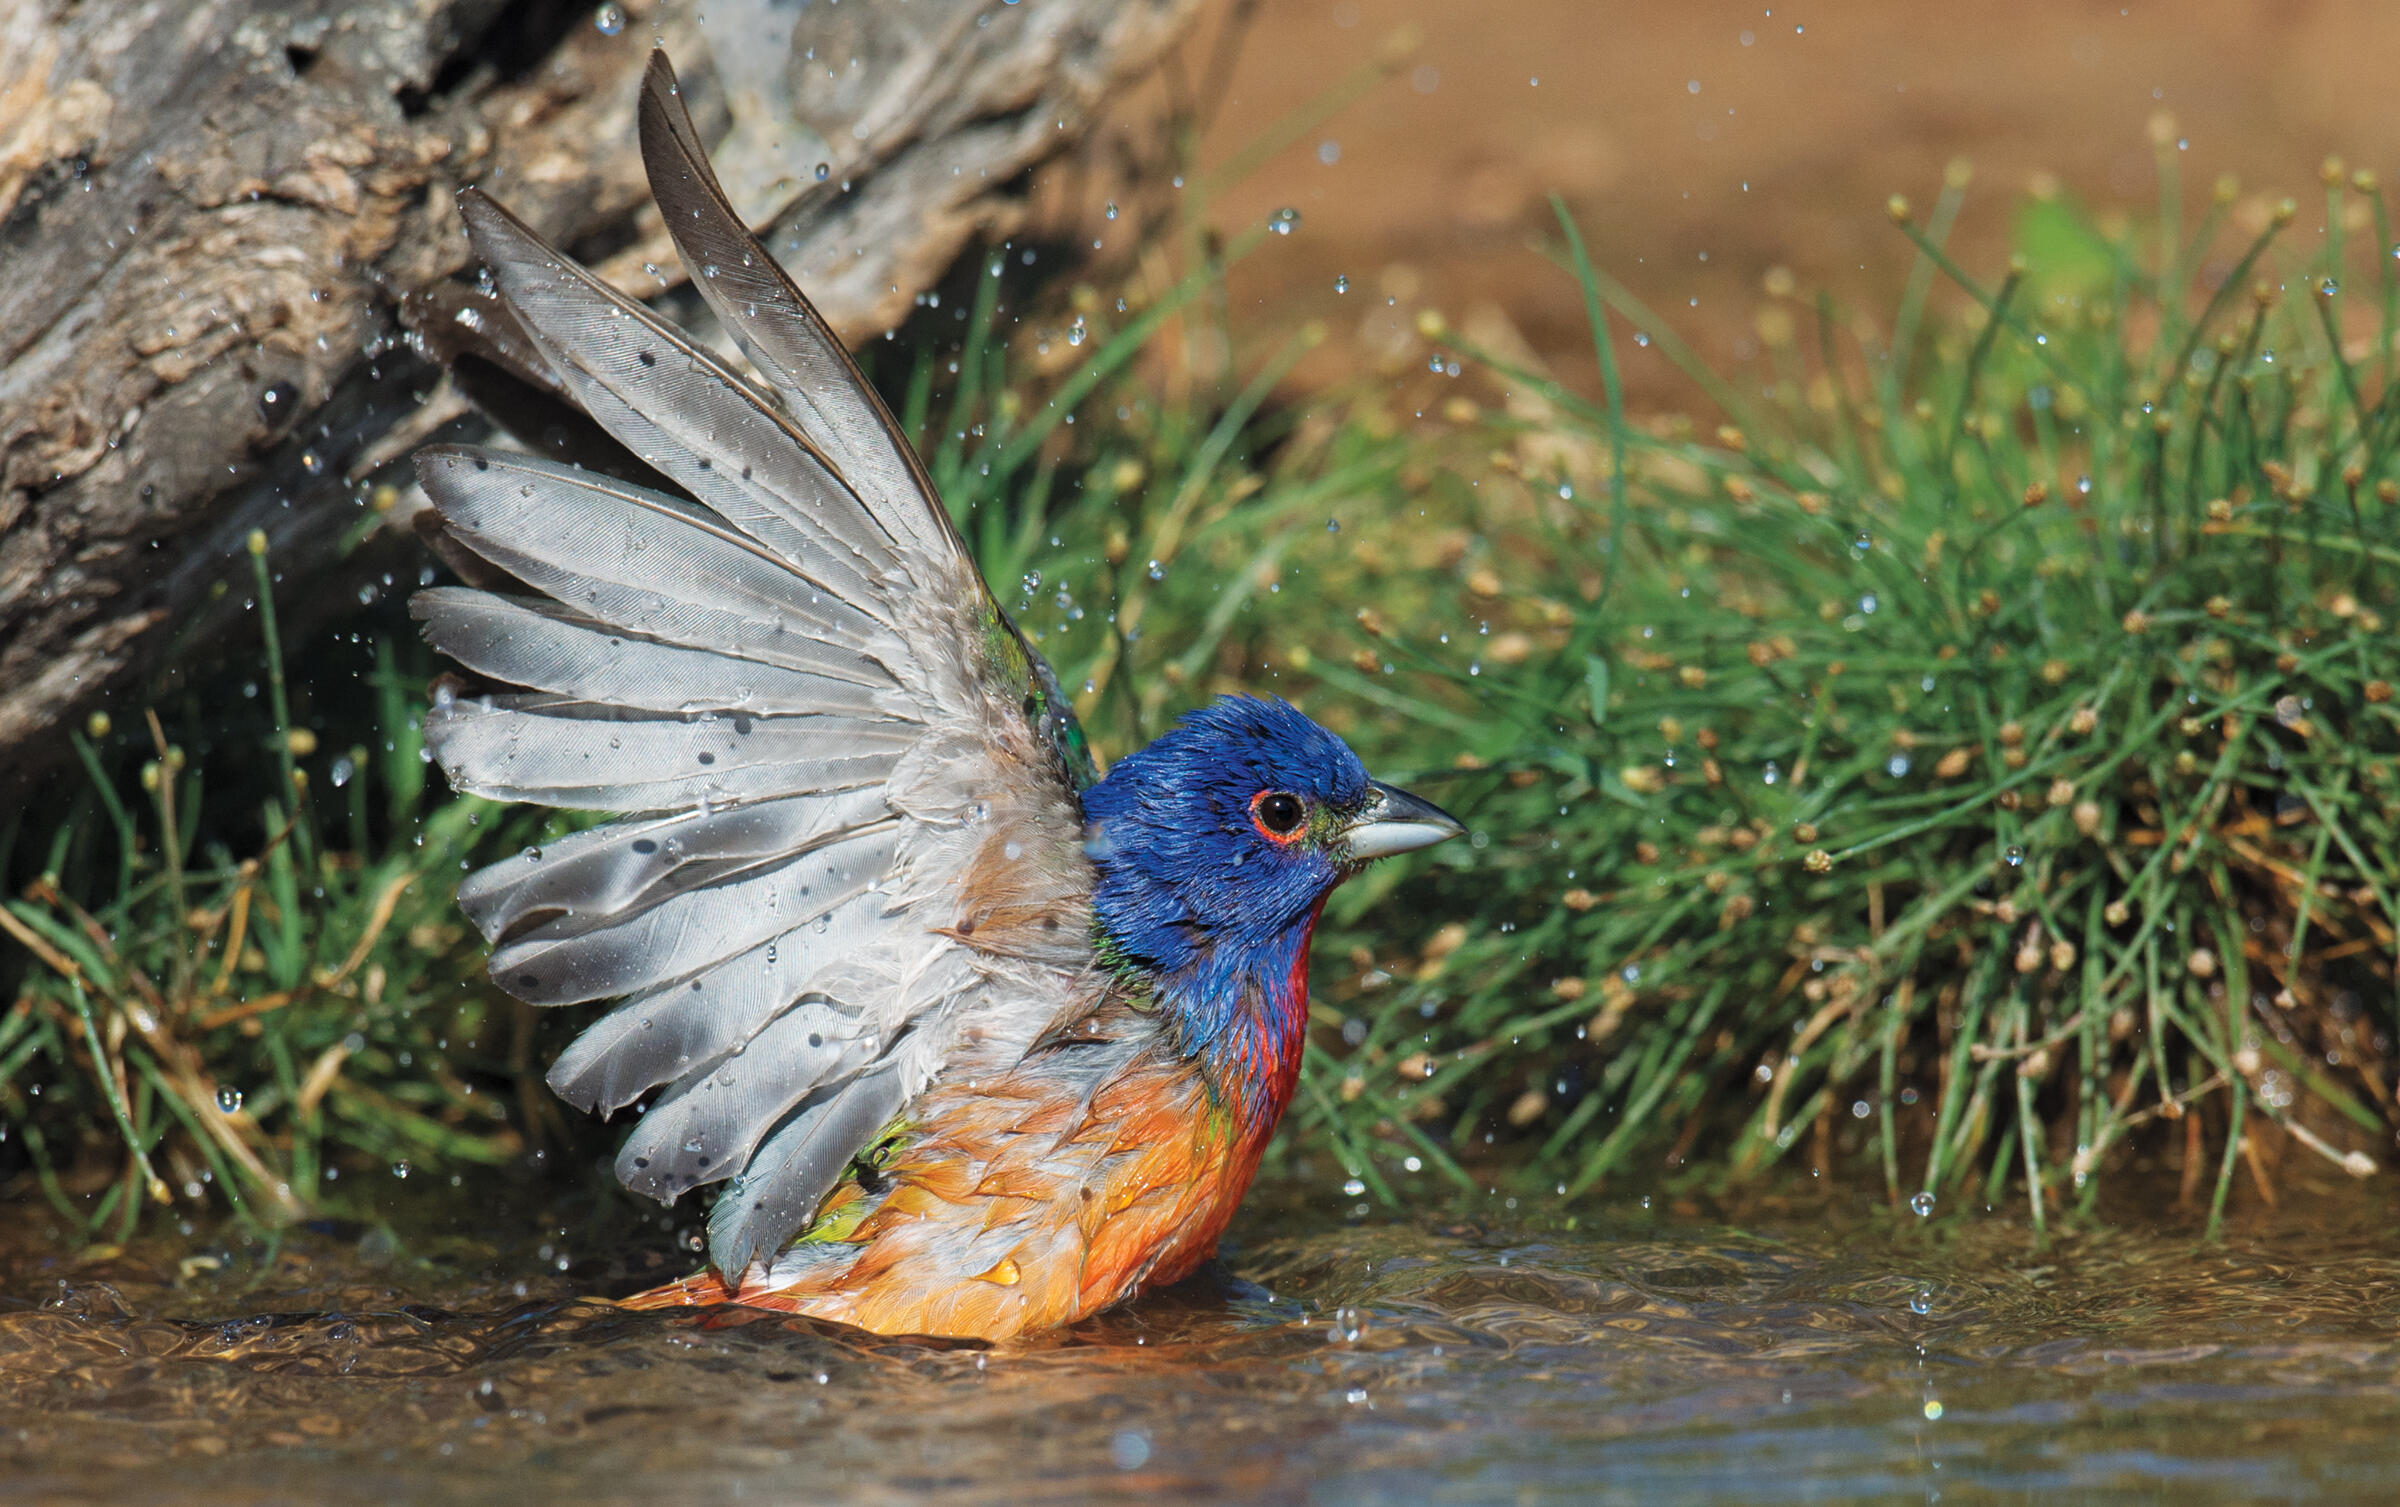 Painted Bunting. Zachary Webster/Audubon Photography Awards